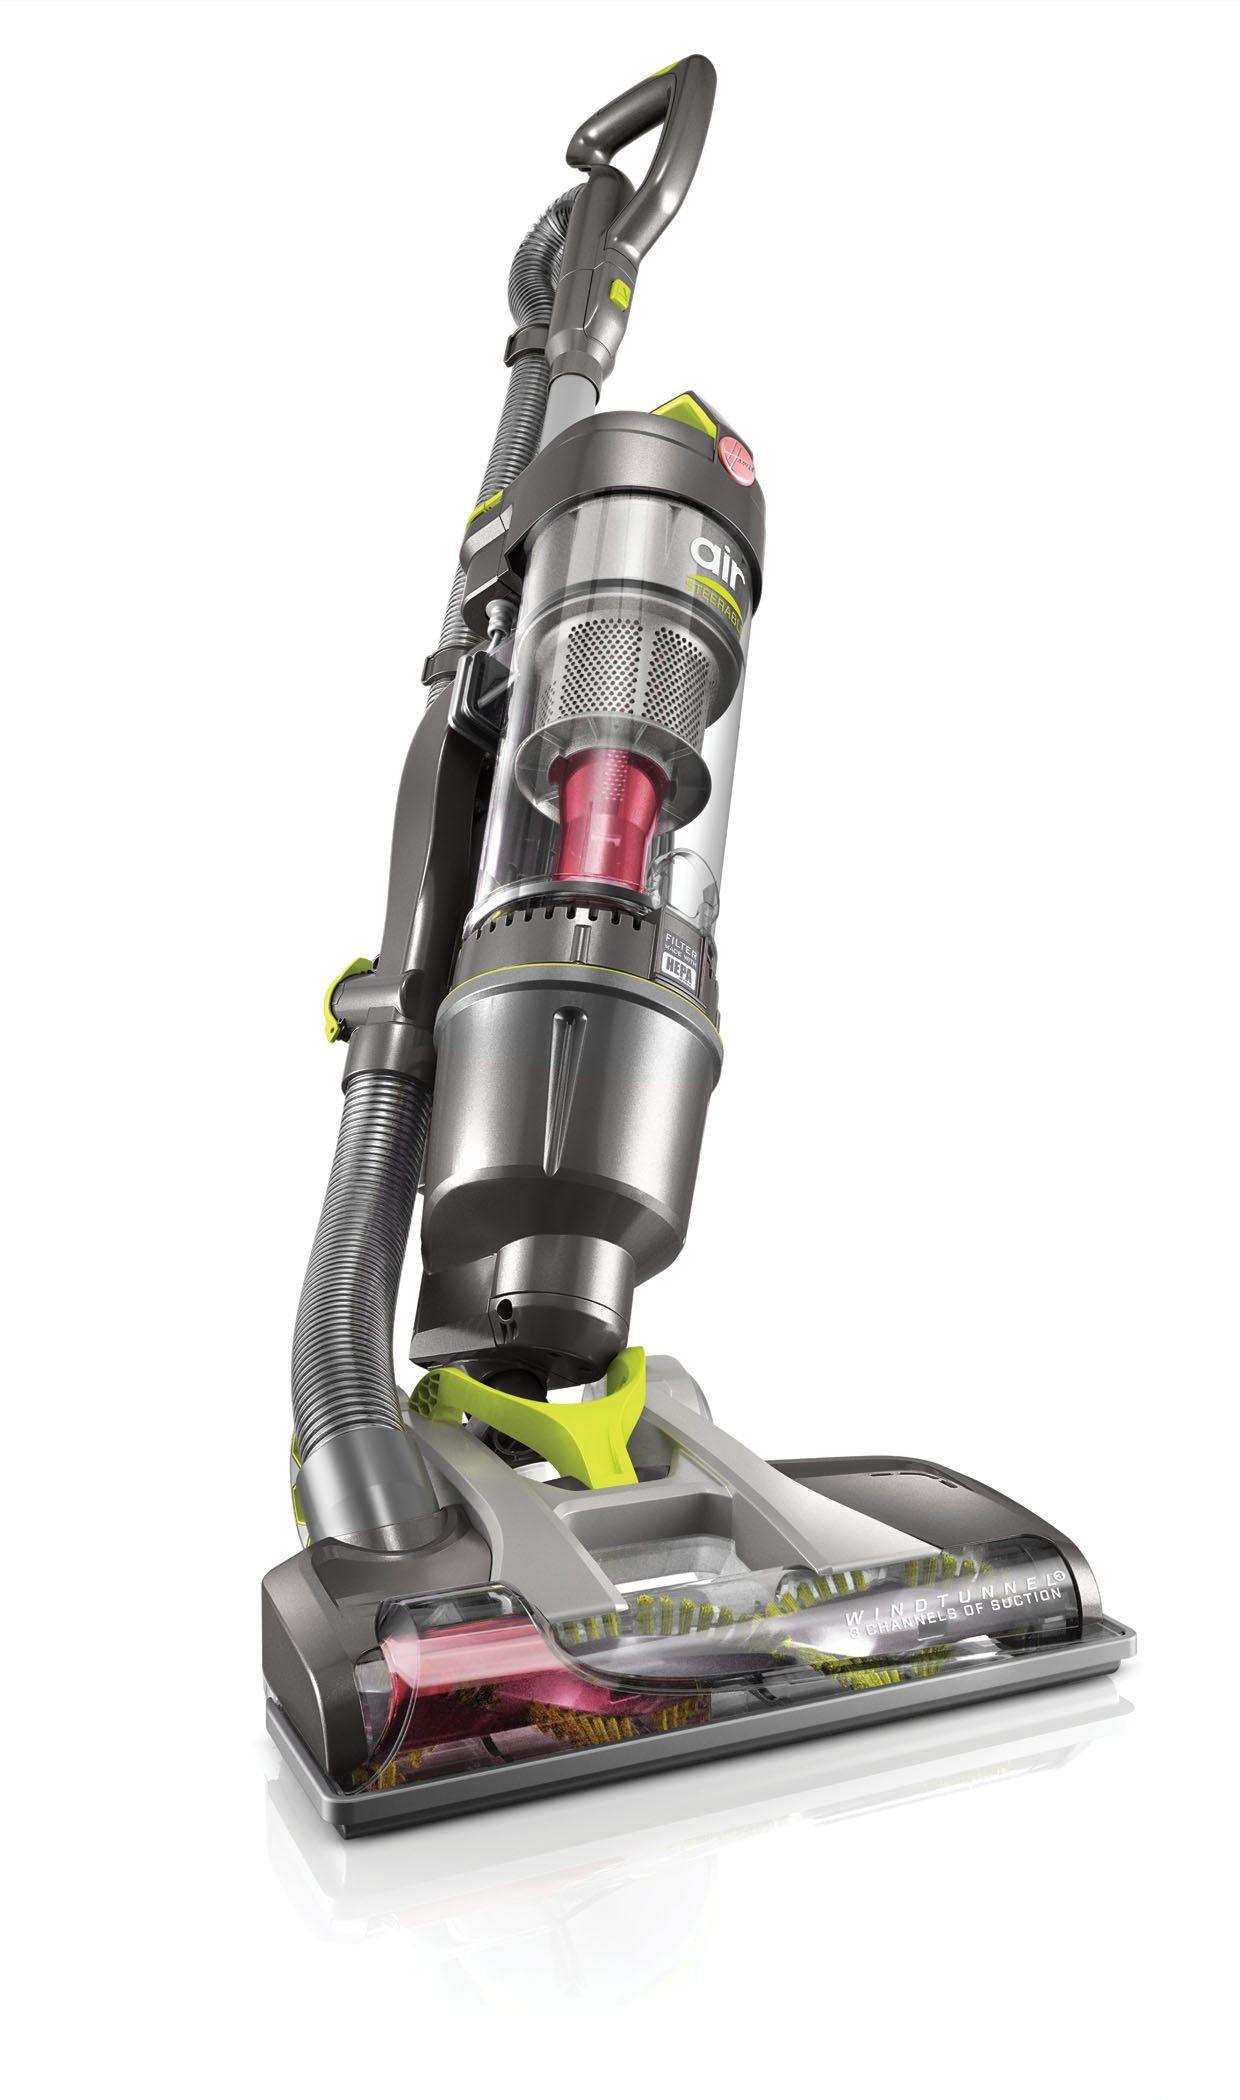 Amazon.com - Hoover UH72400 WindTunnel Air Steerable Bagless Upright Vacuum…  Vacuum Repair,